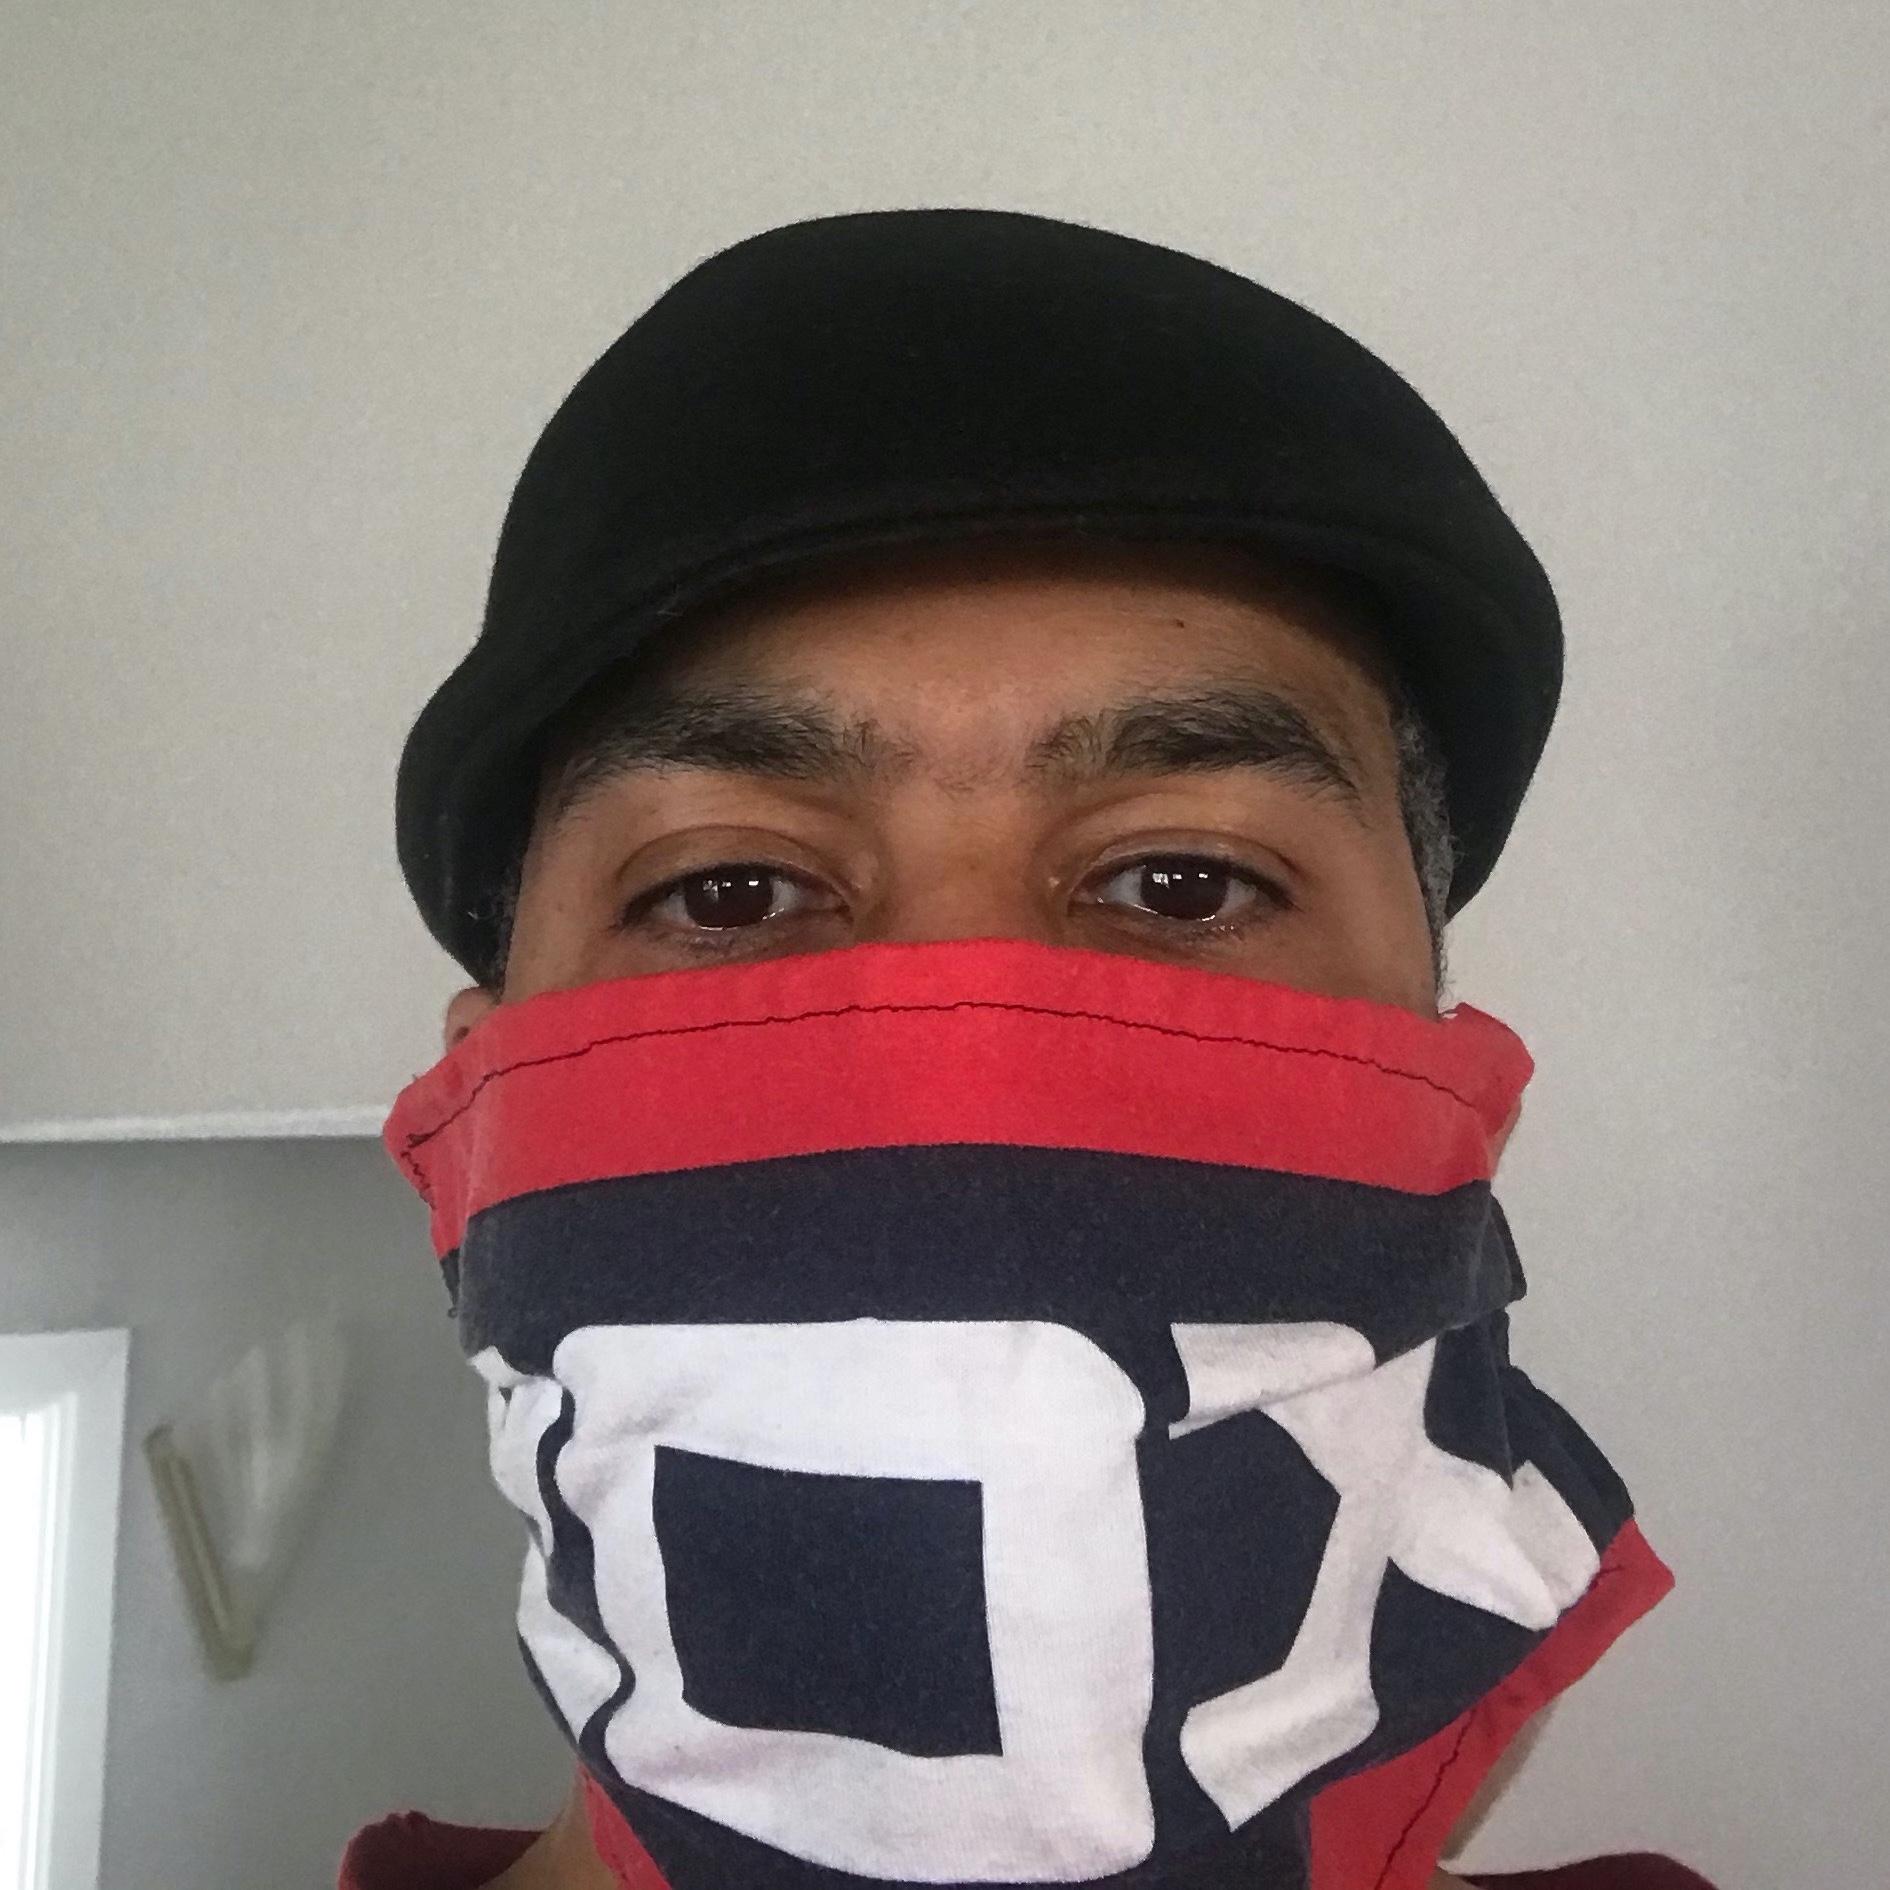 ESC Volunteer in Sox Mask 1